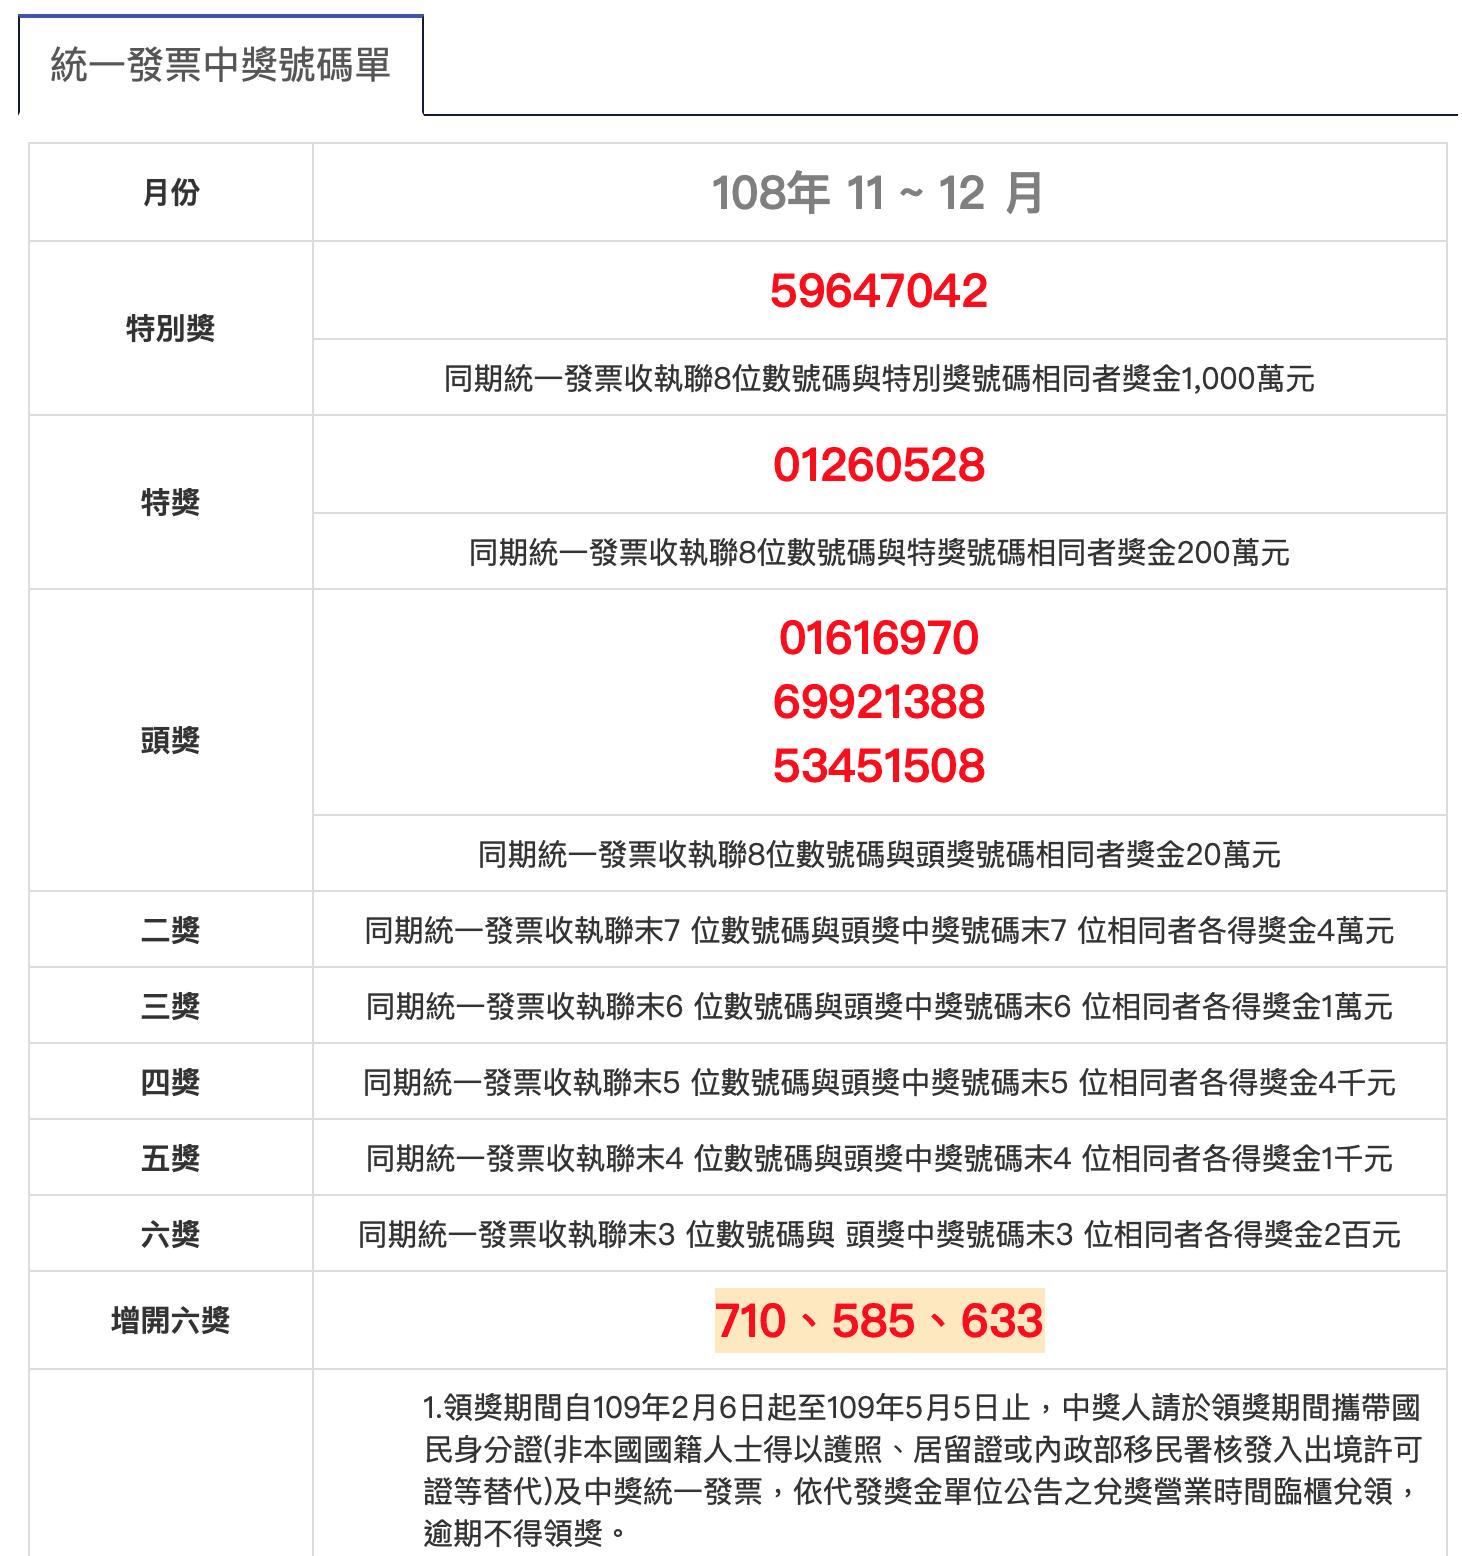 Uniform invoice winning numbers Taiwan Penghu Kinmen Matsu Republic of China Nov Dec 2019 民國 108 年 11、12 月統一發票號碼中獎號碼、獎金兌獎說明 2019